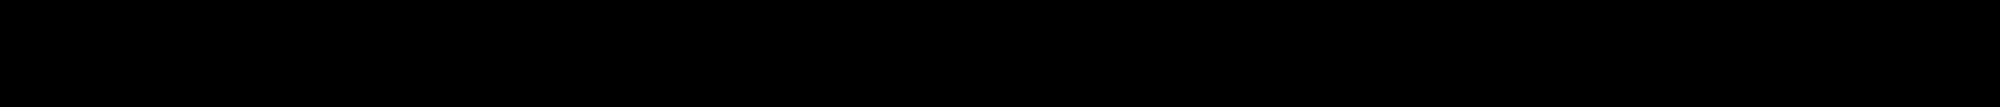 black wavy text divider.png